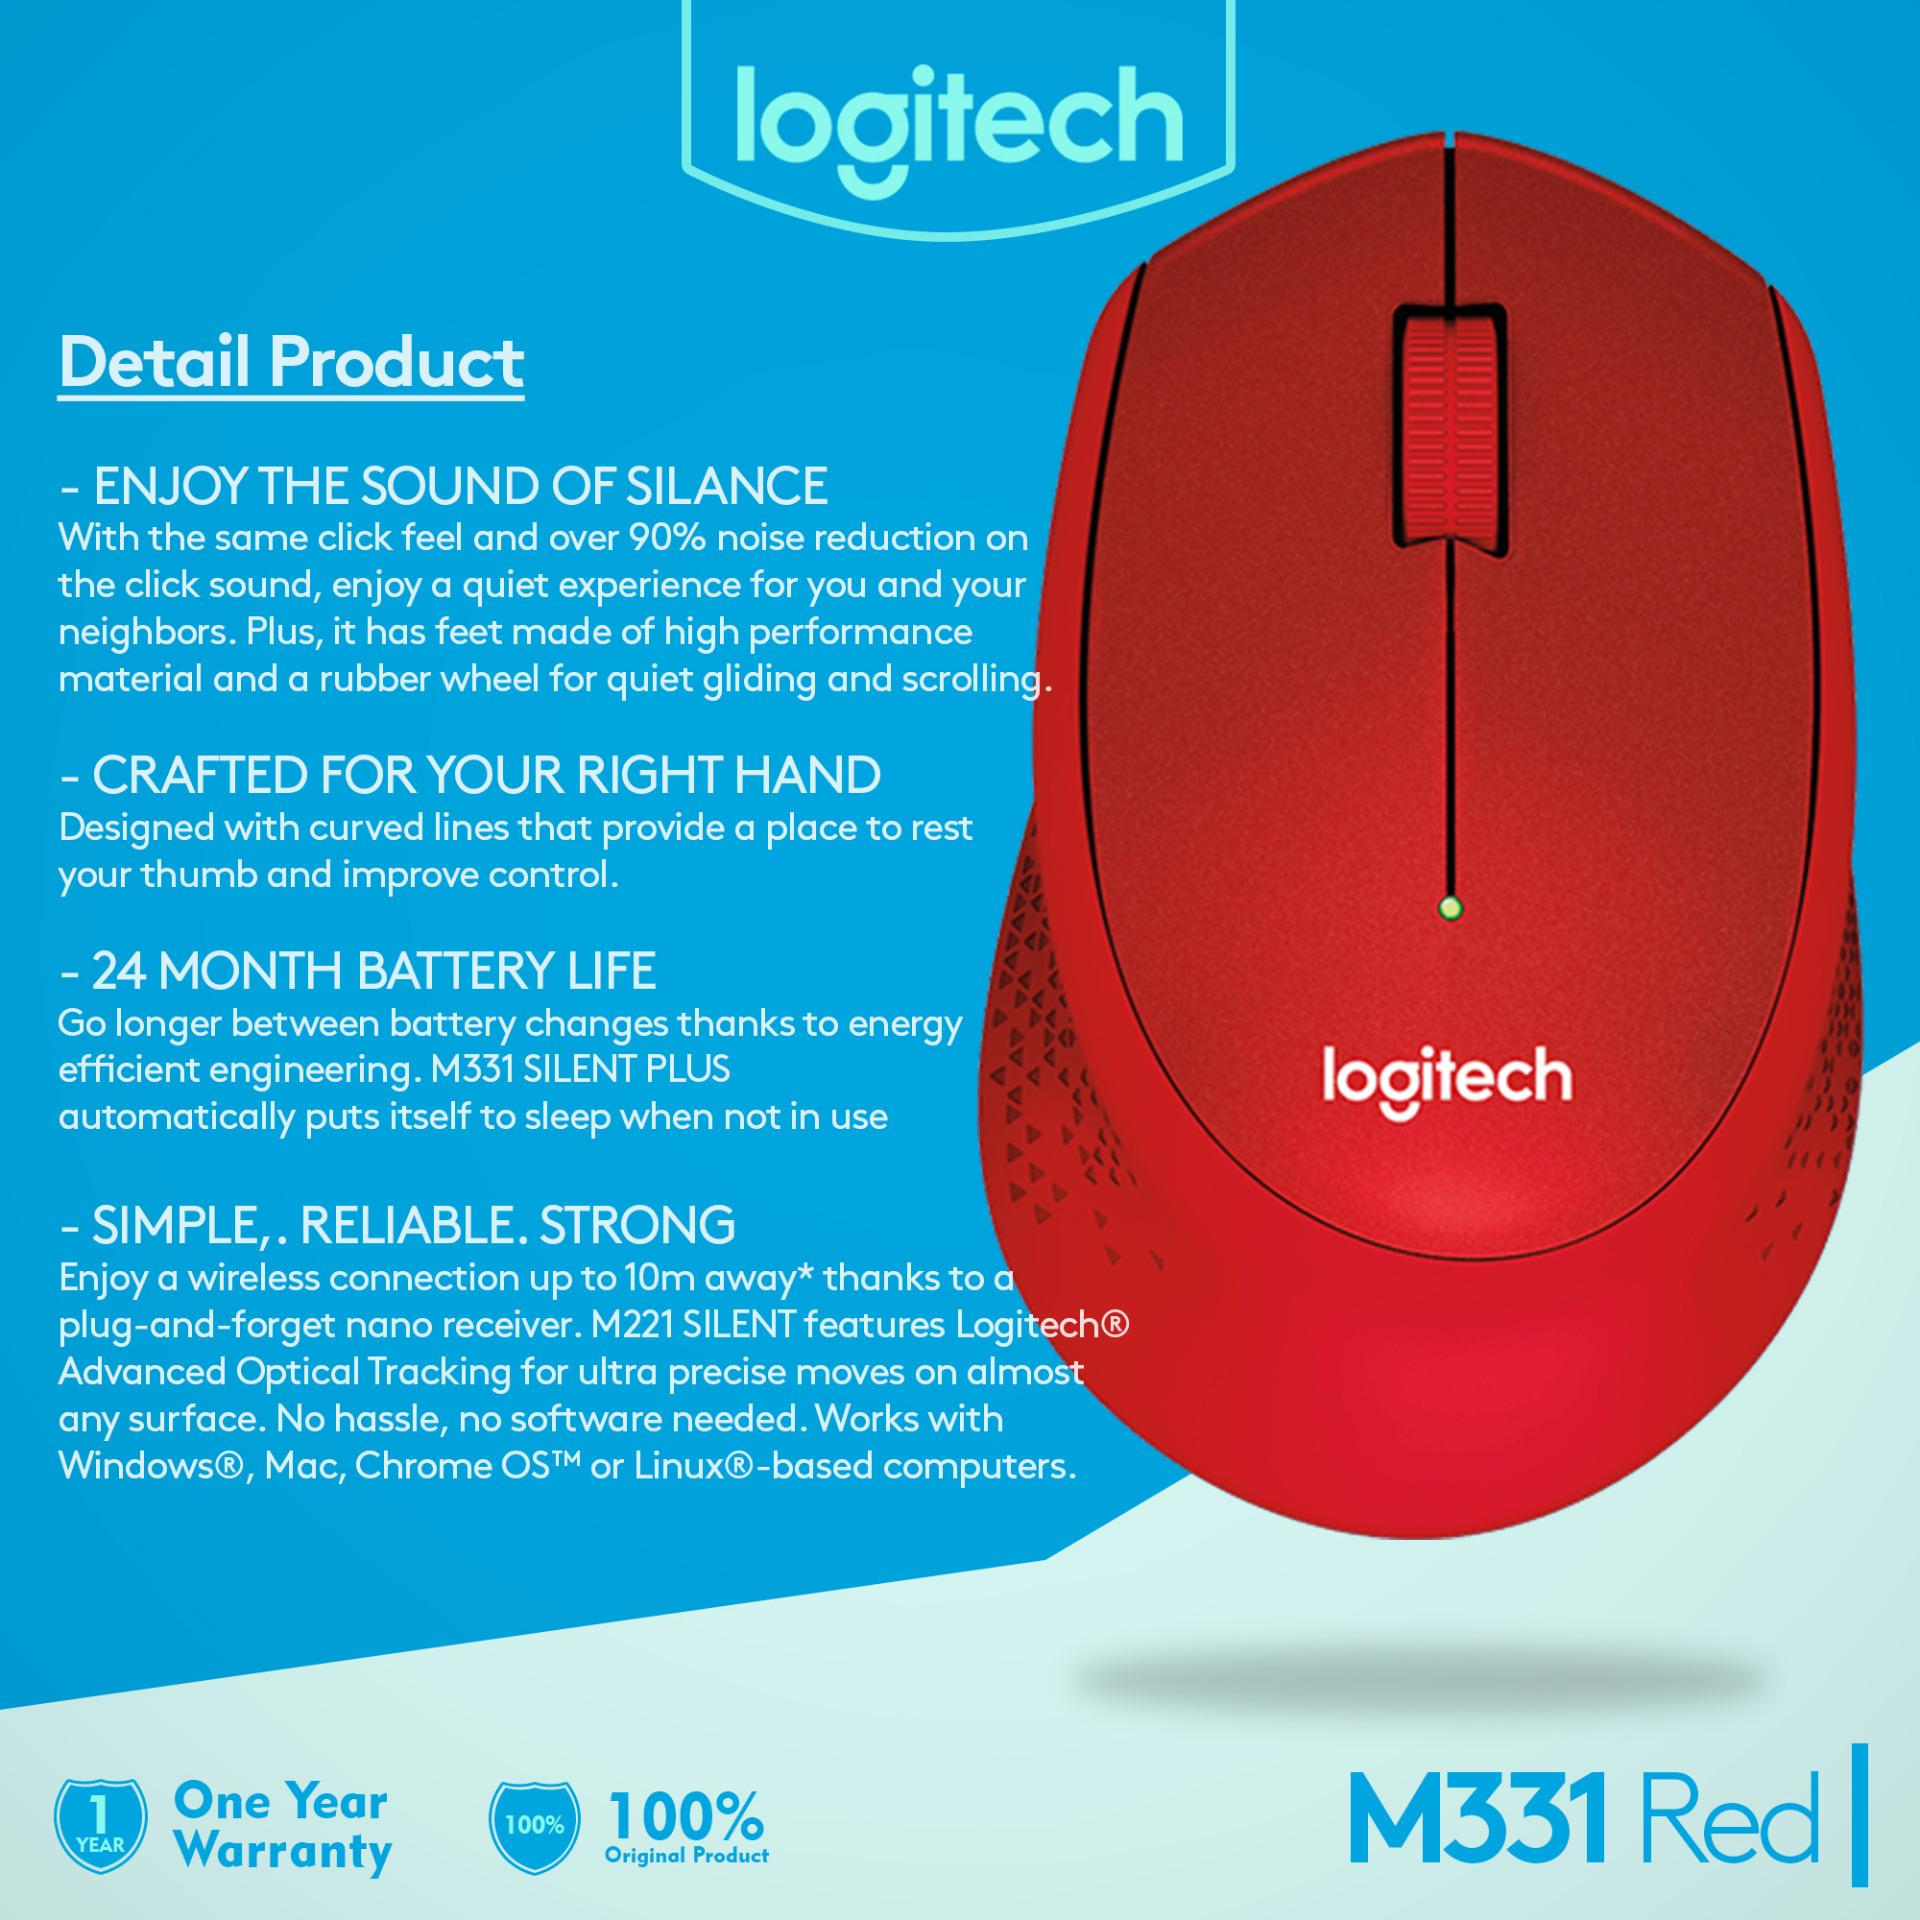 Beli Logitech M331 Silent Wireless Mouse Original Merah Pake Kartu Kredit